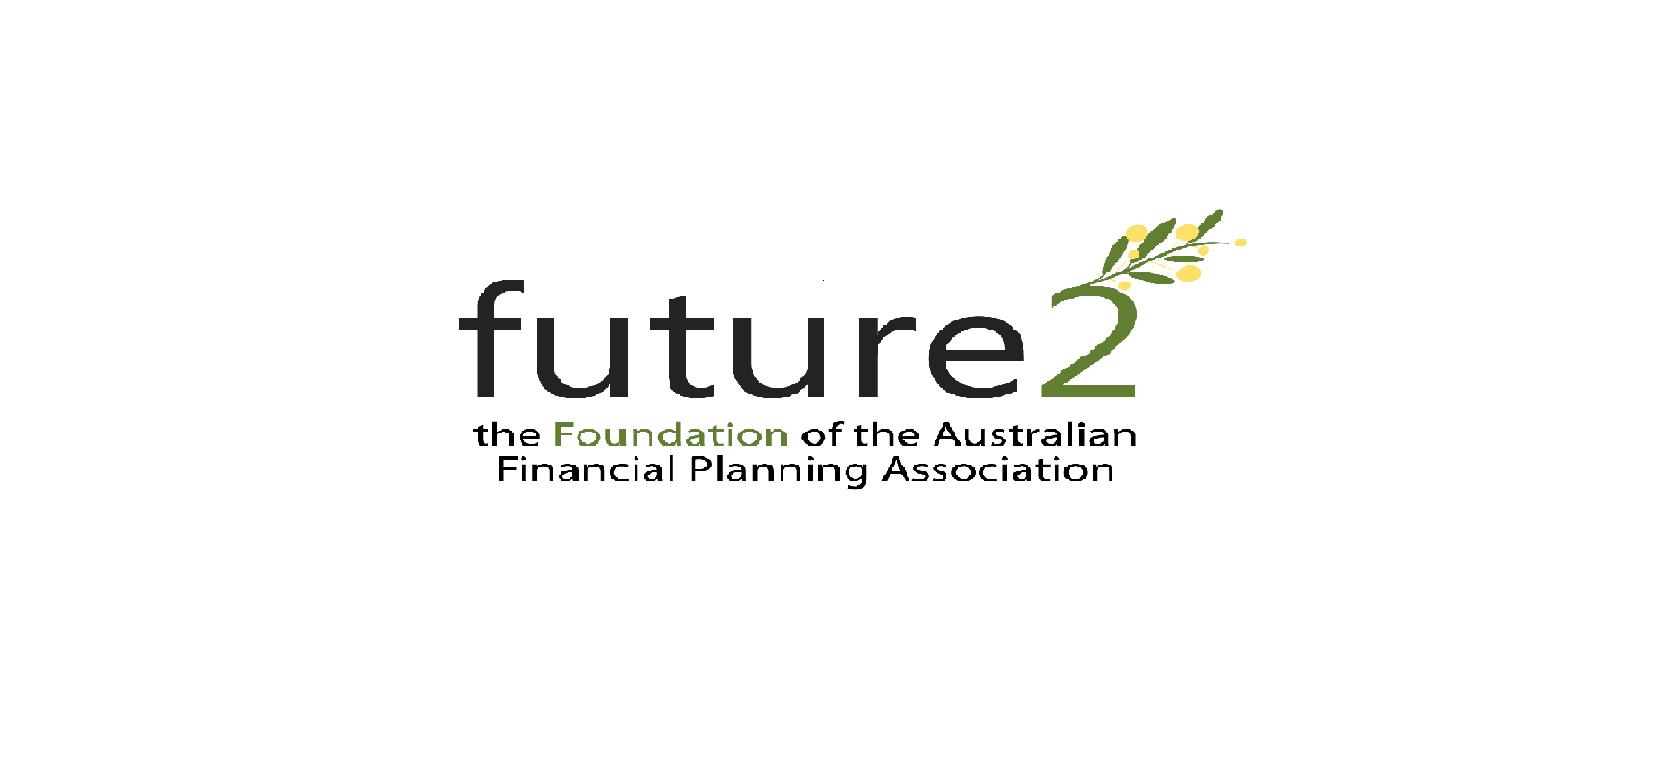 Future2 Foundation